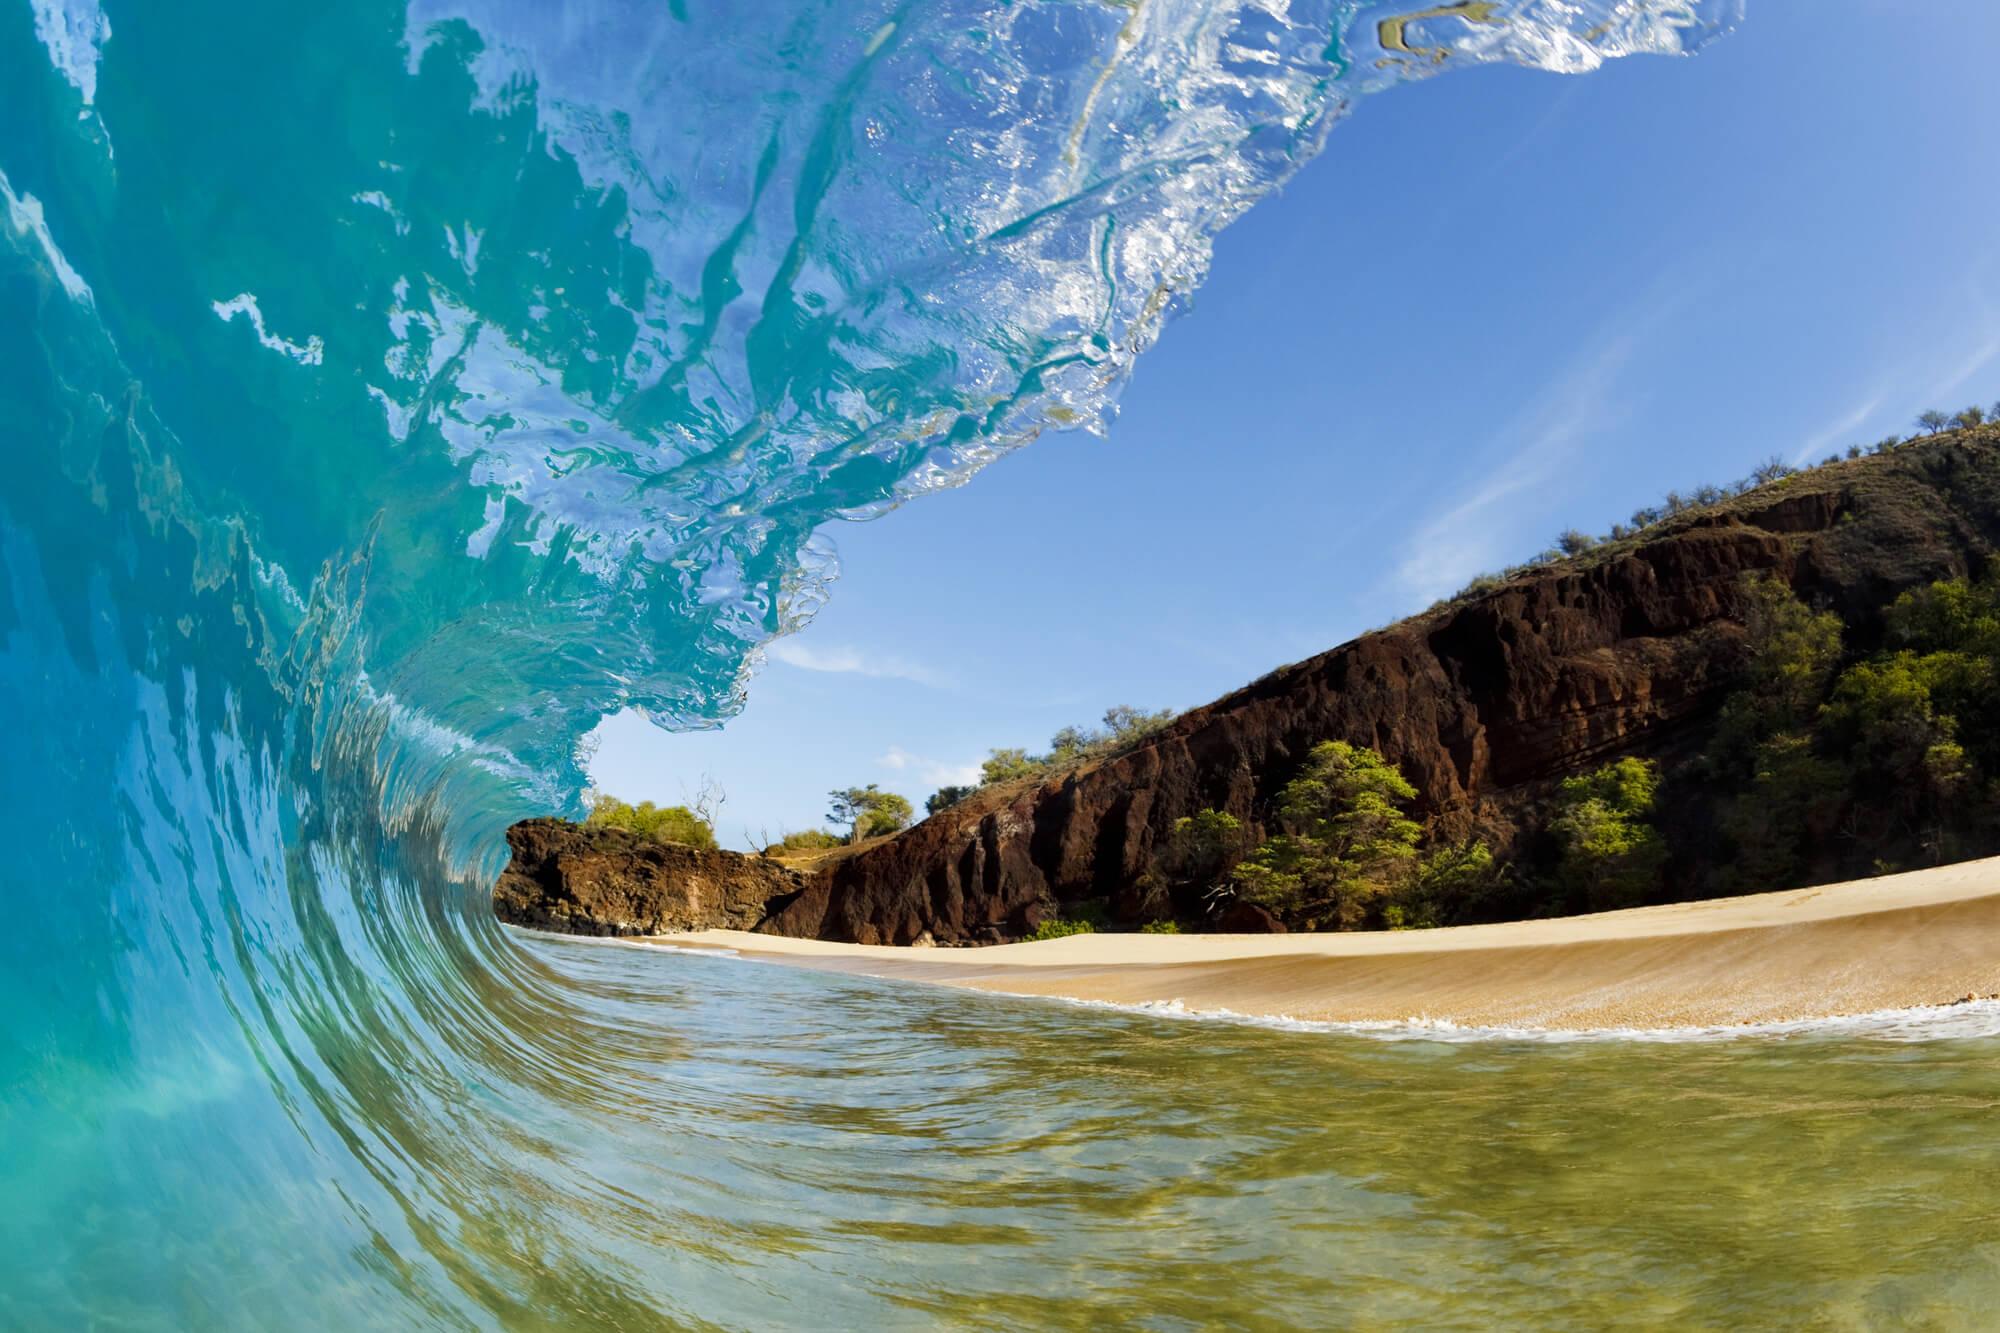 Hawaii makena beach beautiful wave breaking along shore wall hawaii makena beach beautiful wave breaking along shore wall mural photo wallpaper amipublicfo Image collections